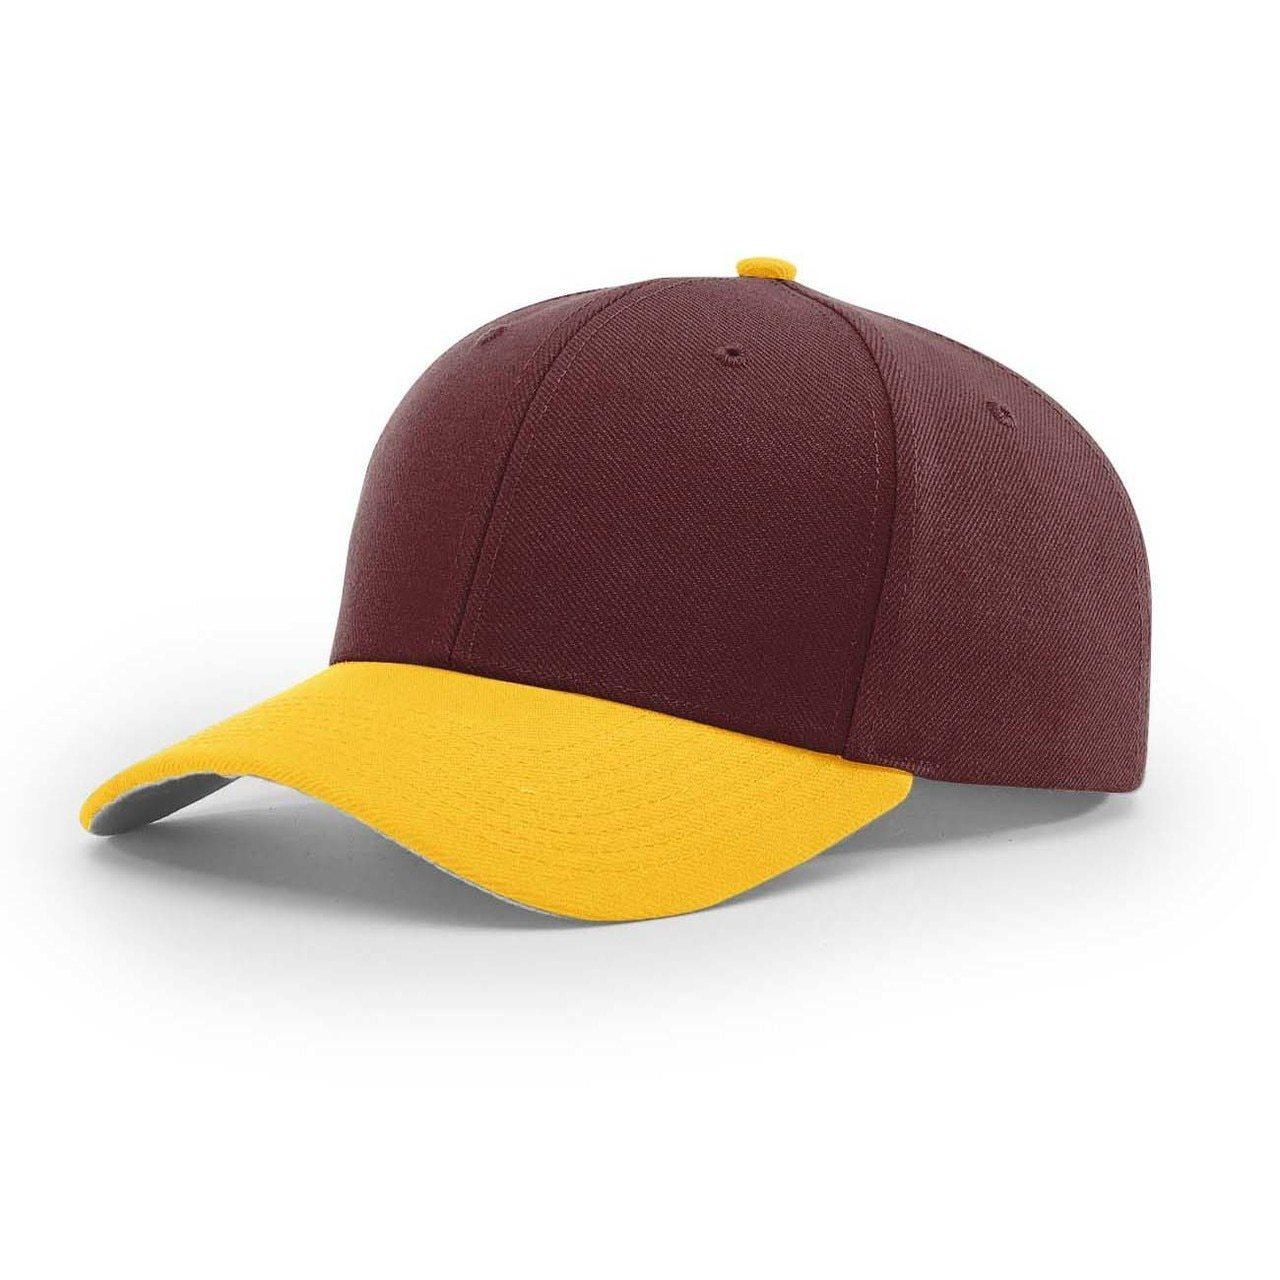 923968d903056 Wholesale - Richardson - On-Field - The Hat Pros